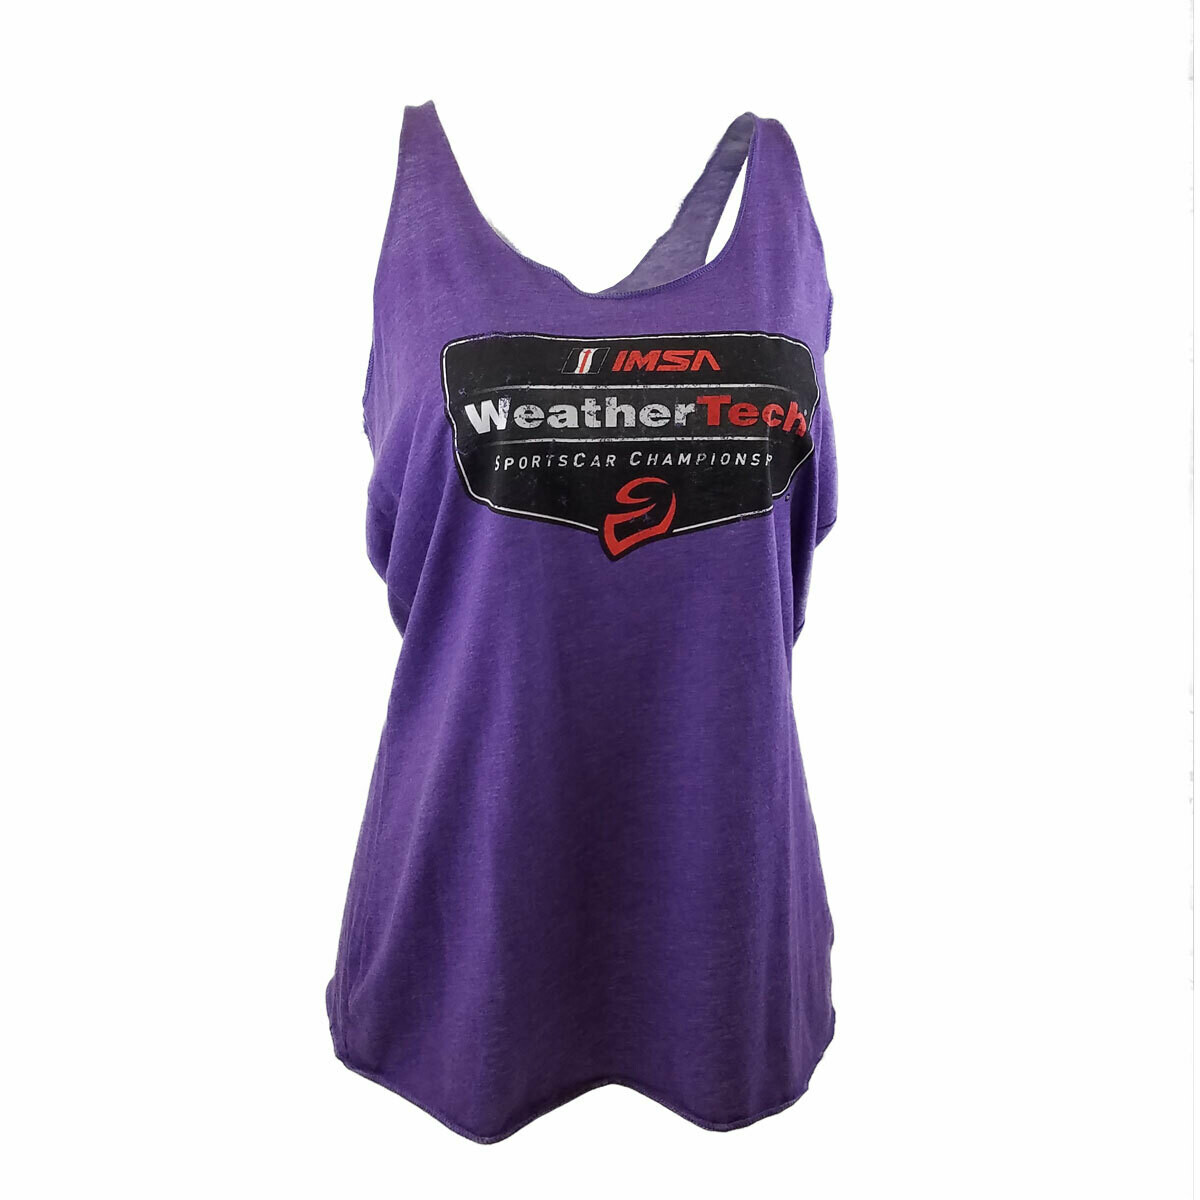 Weathertech Tank Top Purple